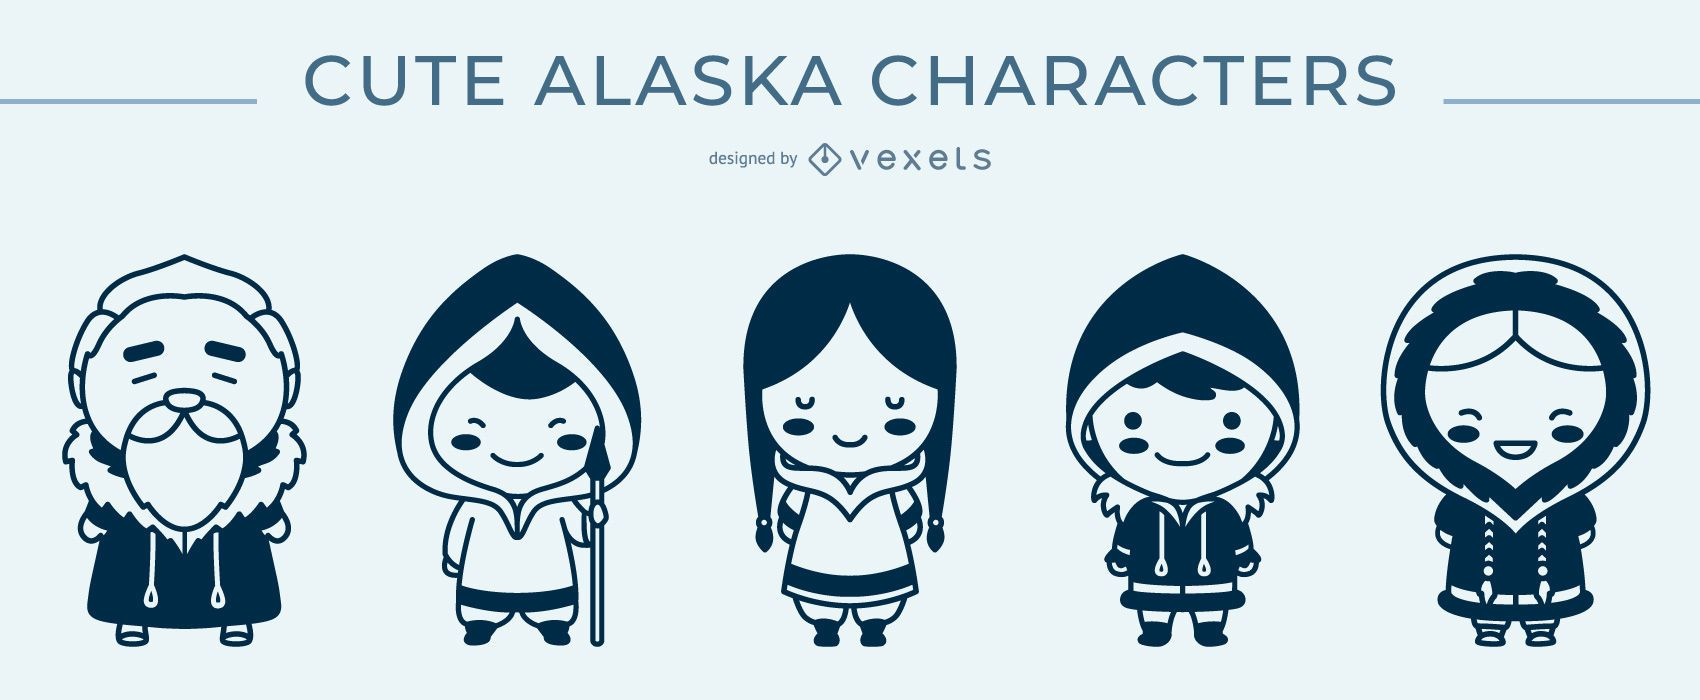 Alaska Cute Character Monochrome Pack